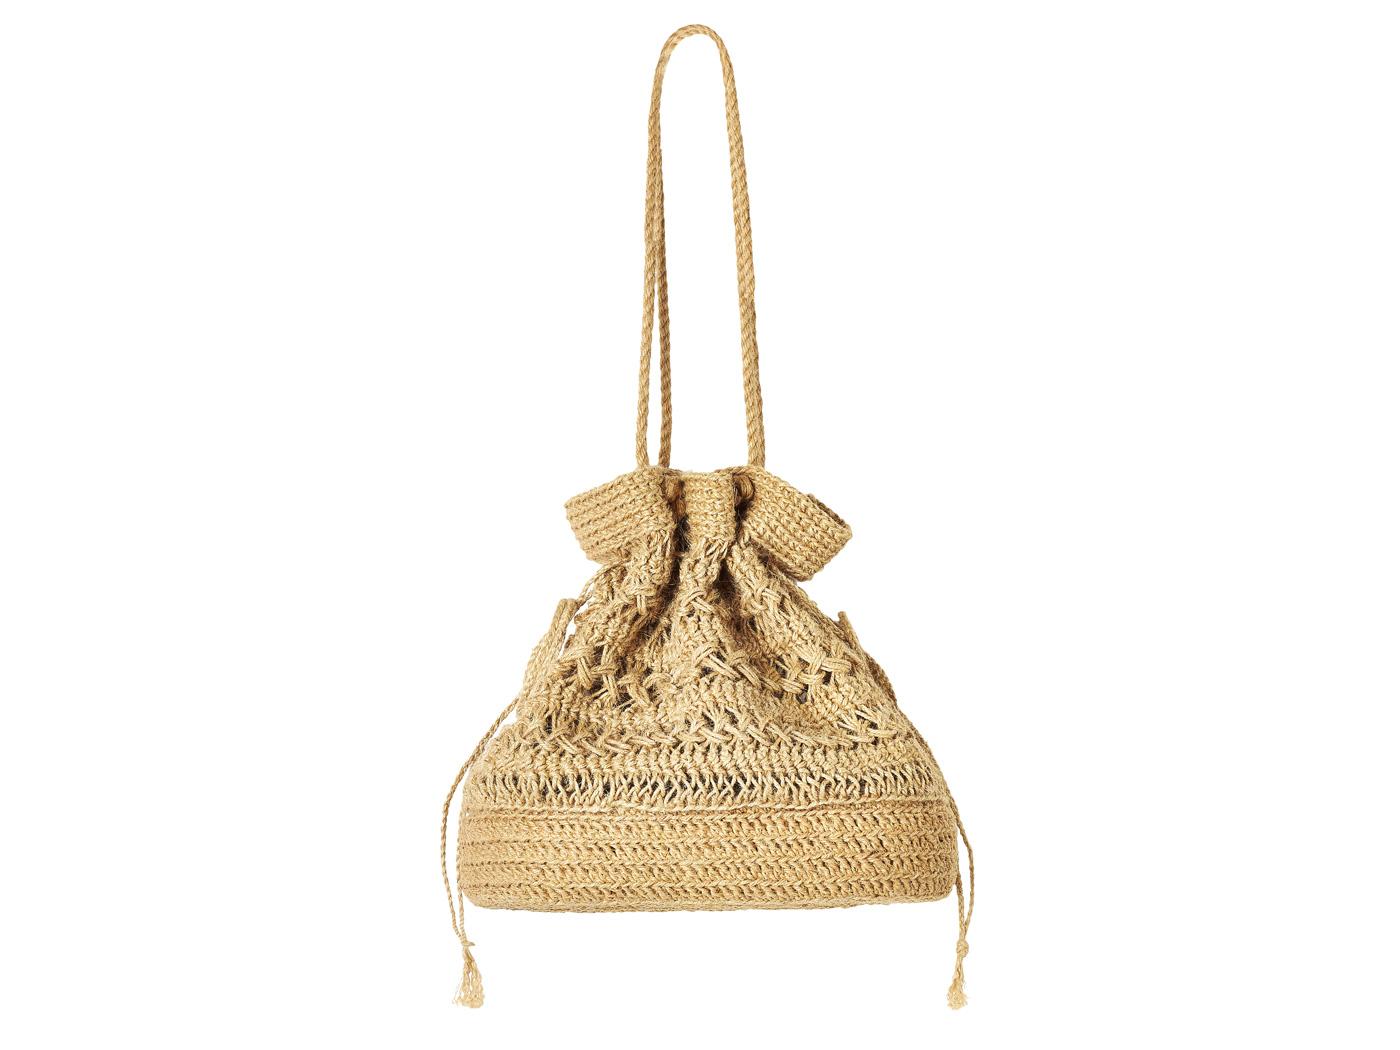 Golovina-fleur-knitted-bag-natural-2